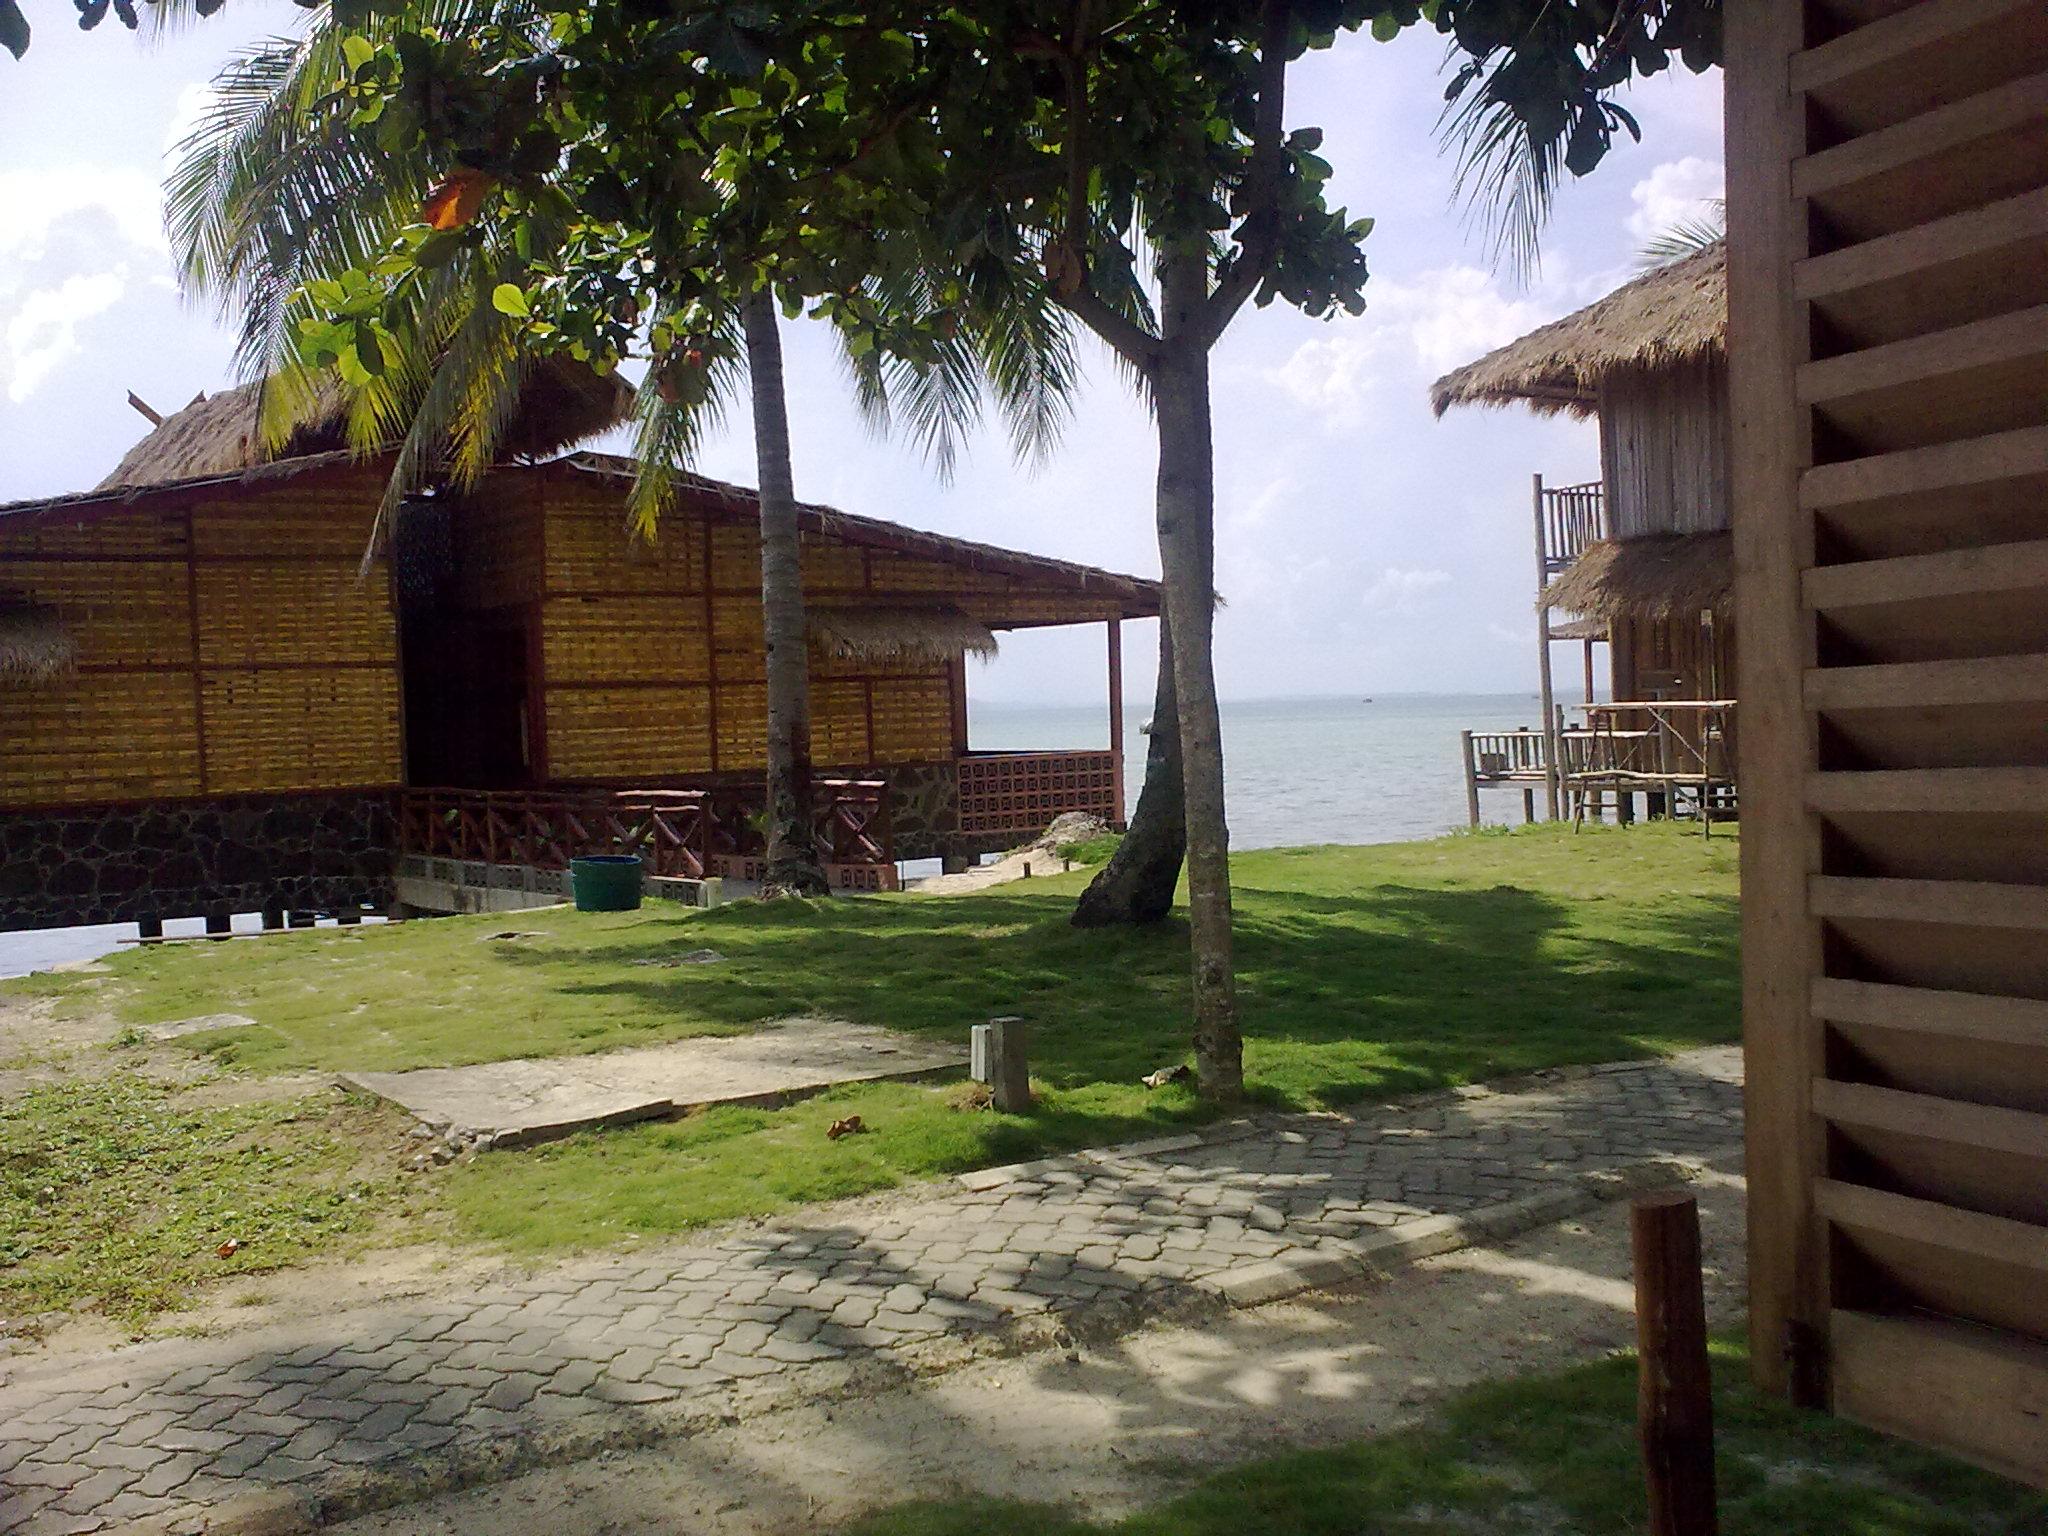 File:Bintan Agro Beach Resort.jpg - Wikipedia, the free encyclopedia